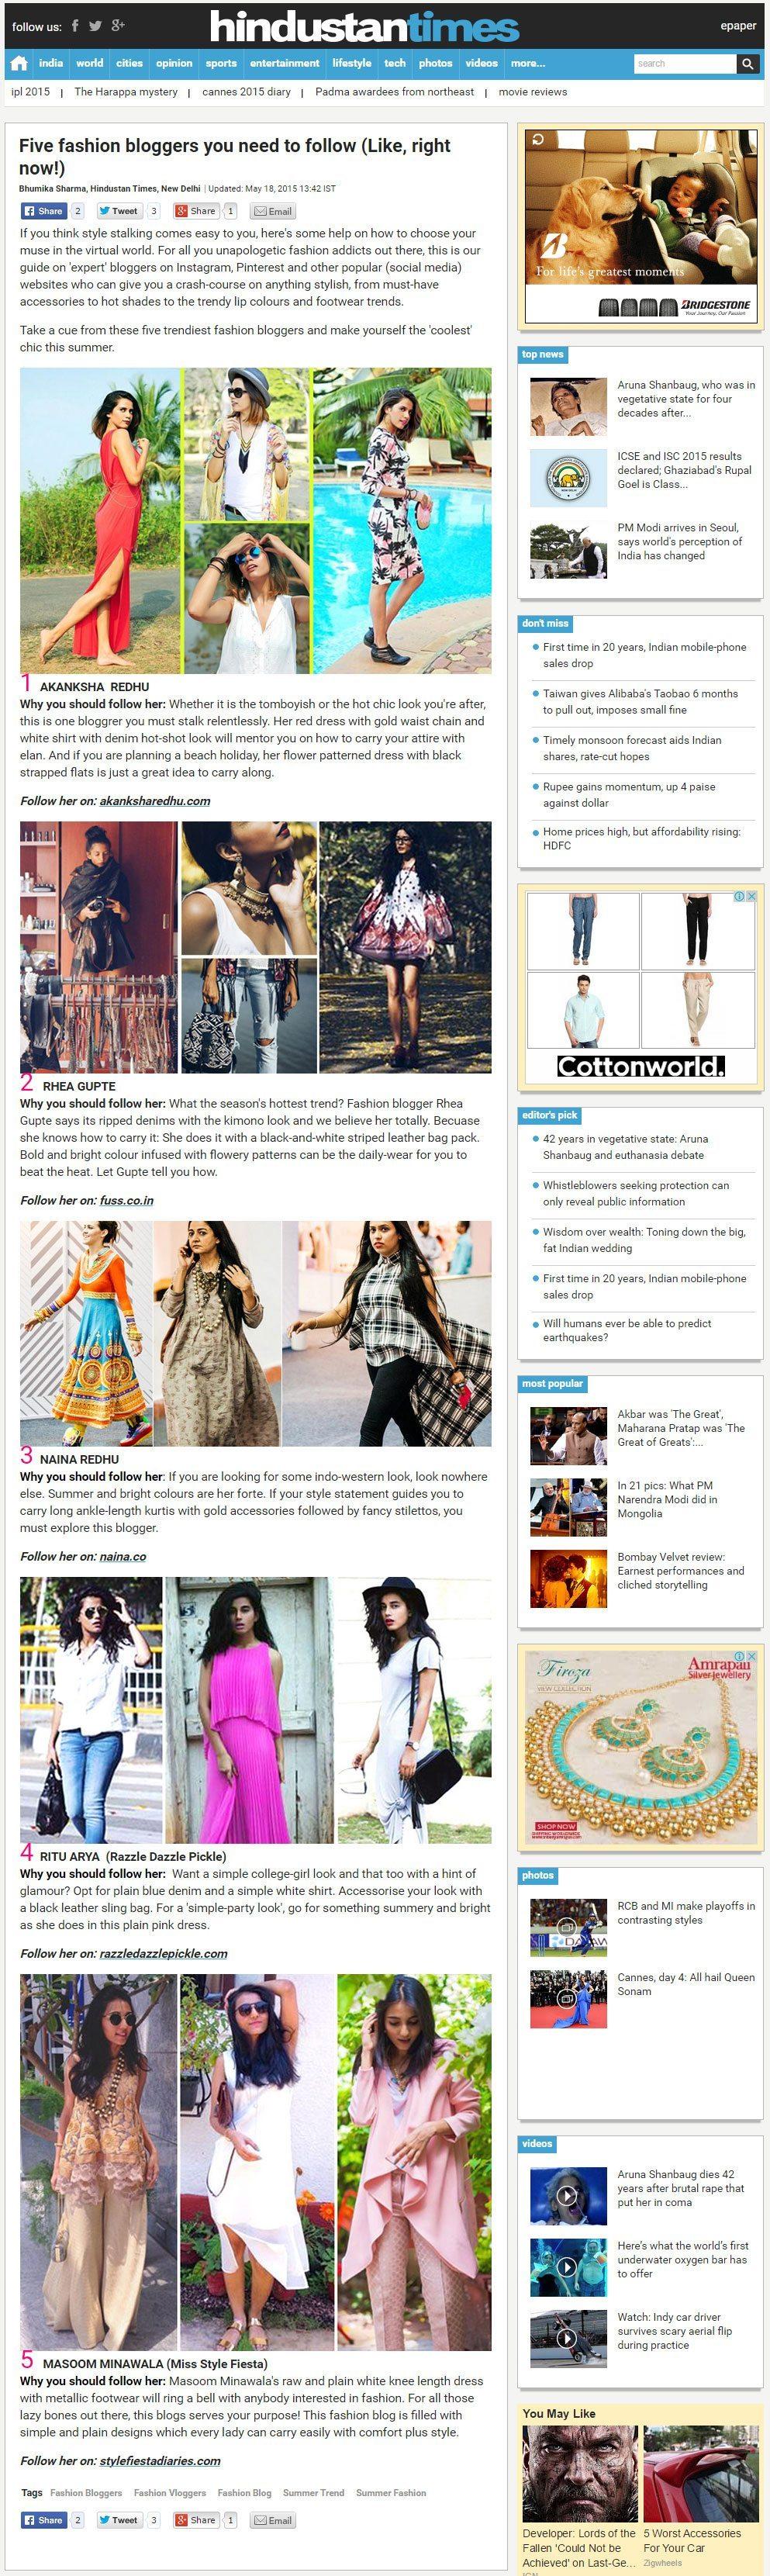 Hindustan Times, Five Fashion Bloggers To Follow, Press, Naina.co Luxury & Lifestyle, Photographer Storyteller, Blogger.